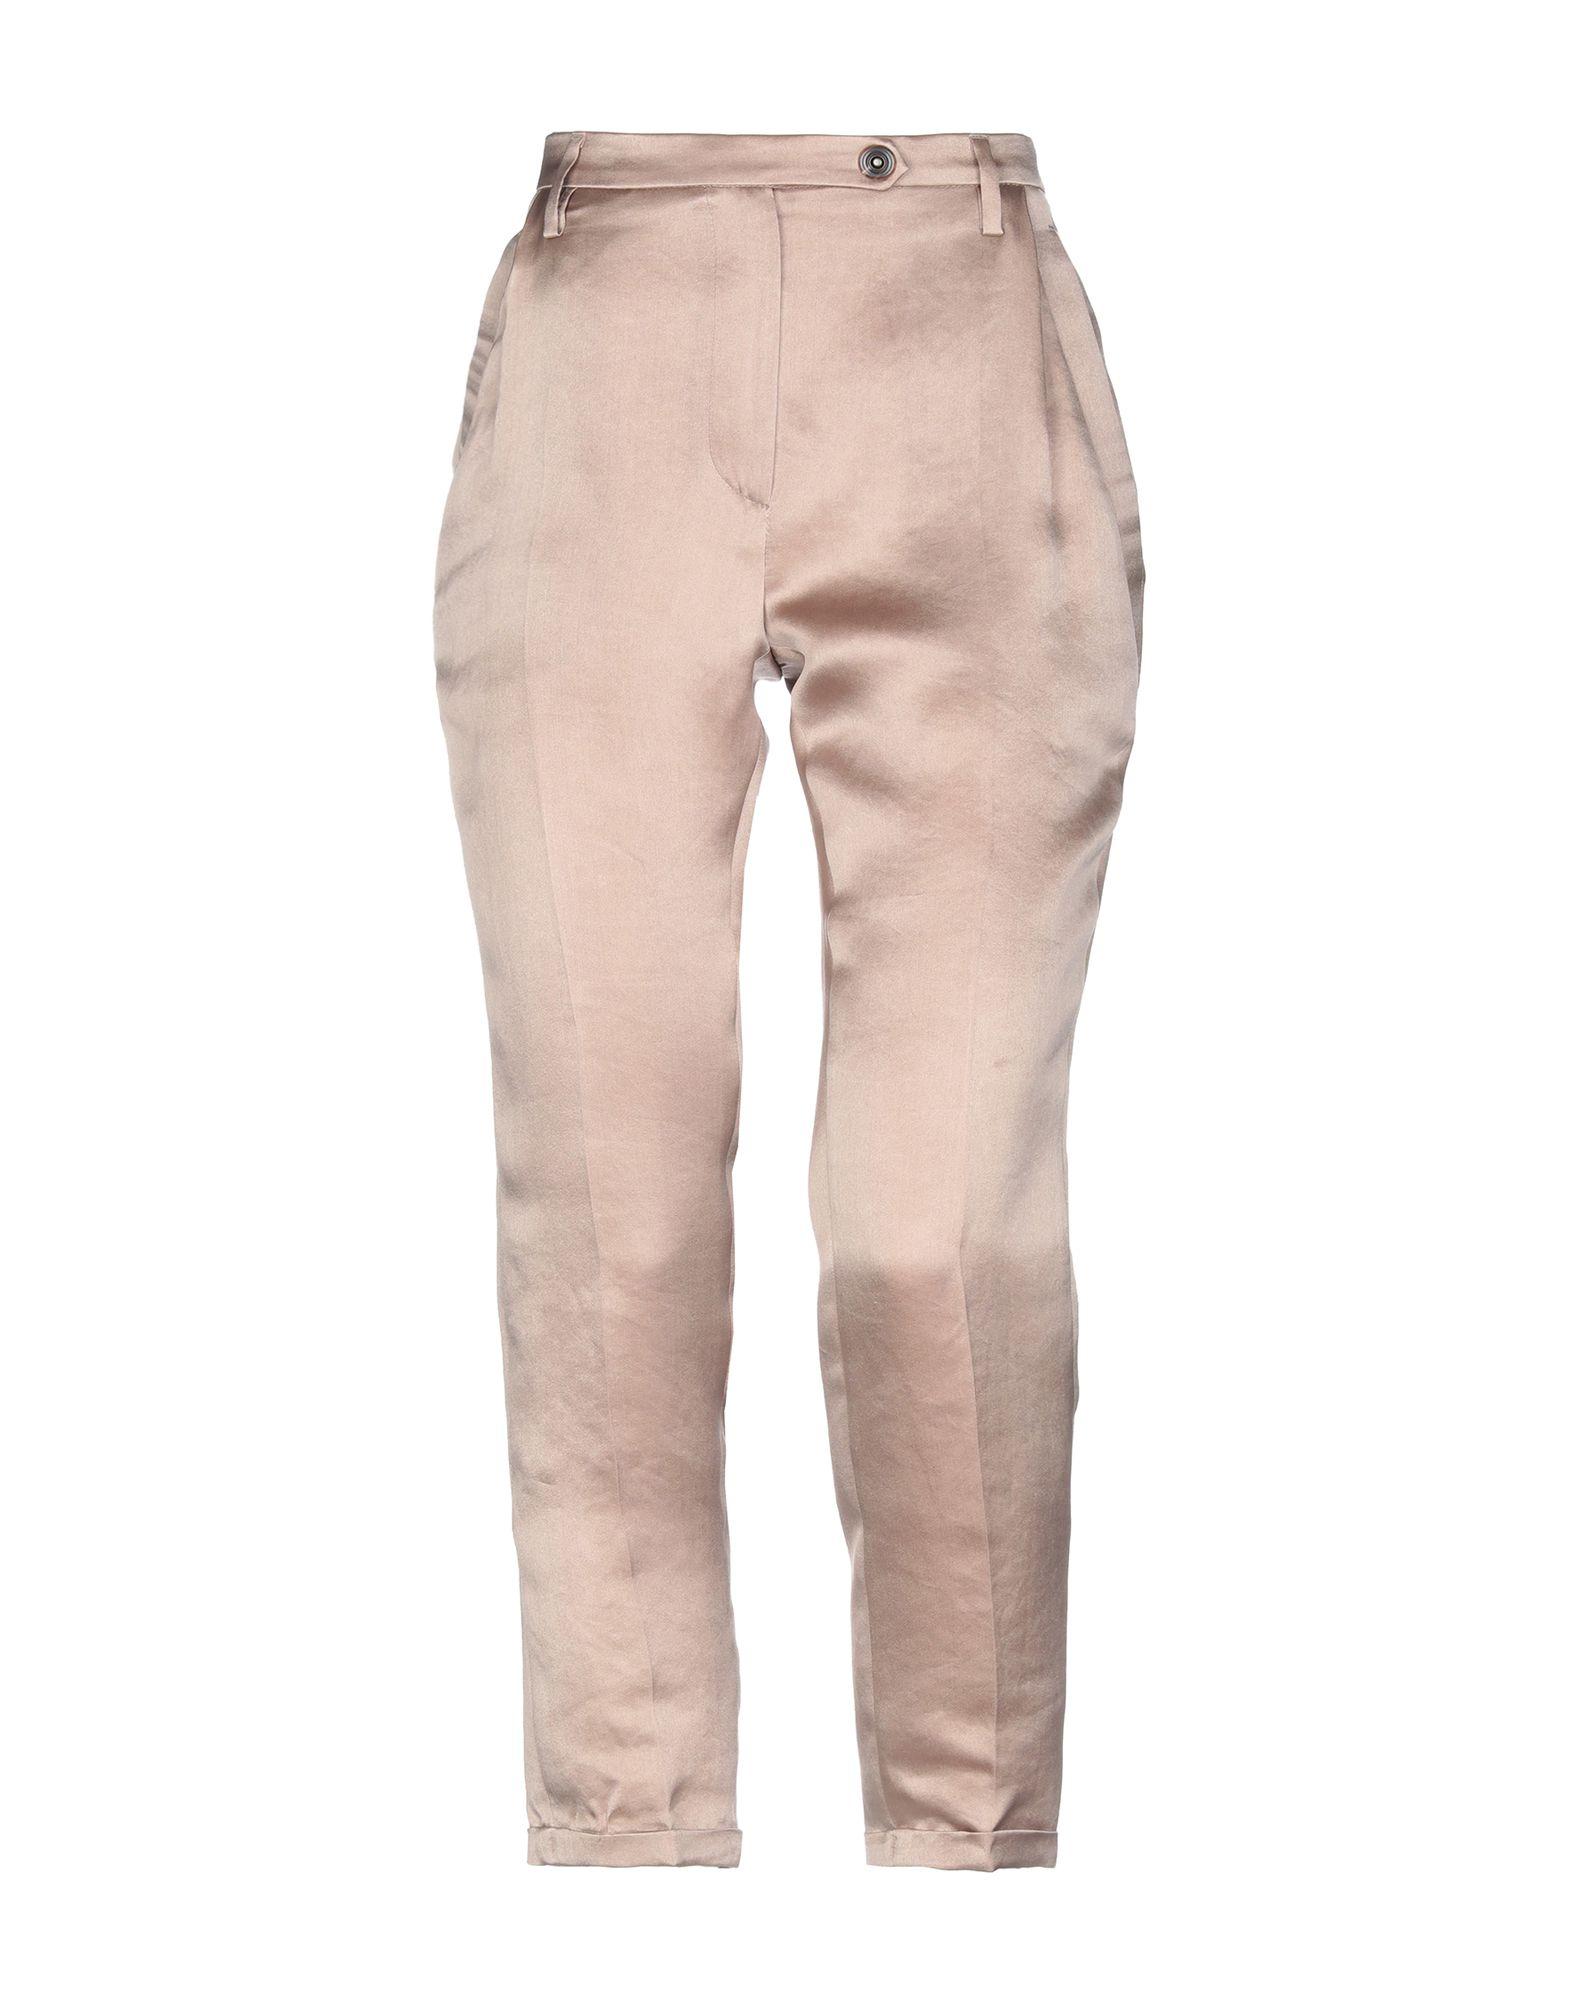 Pantalone Pantalone Pantalone Brunello Cucinelli donna - 13205303   68f